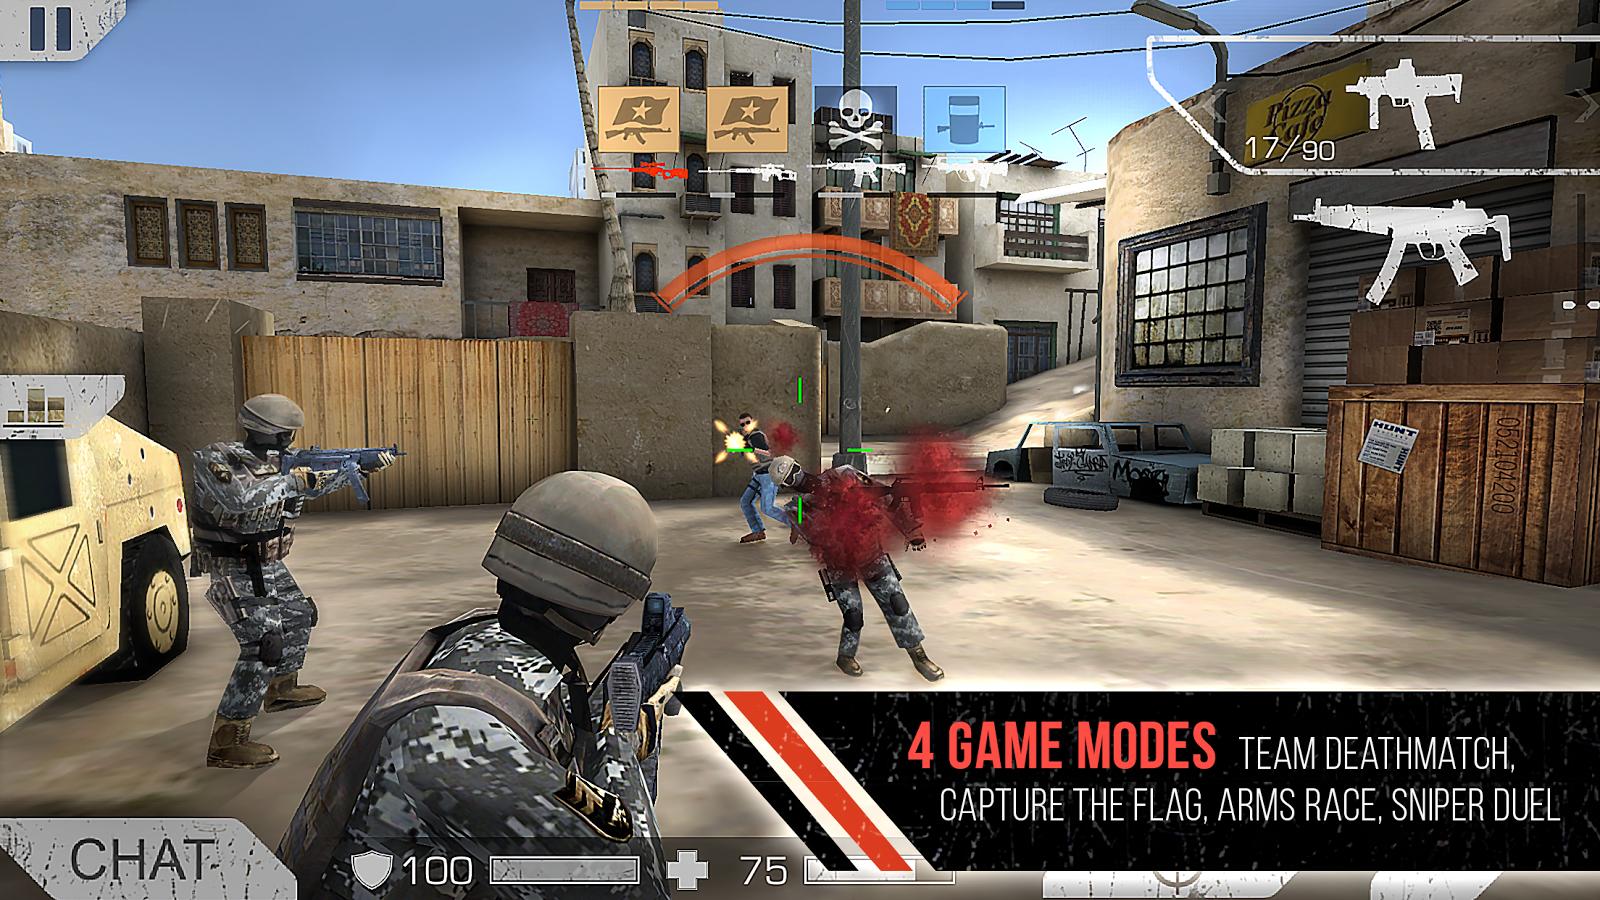 Standoff Multiplayer mod apk unlimited money, fast level up